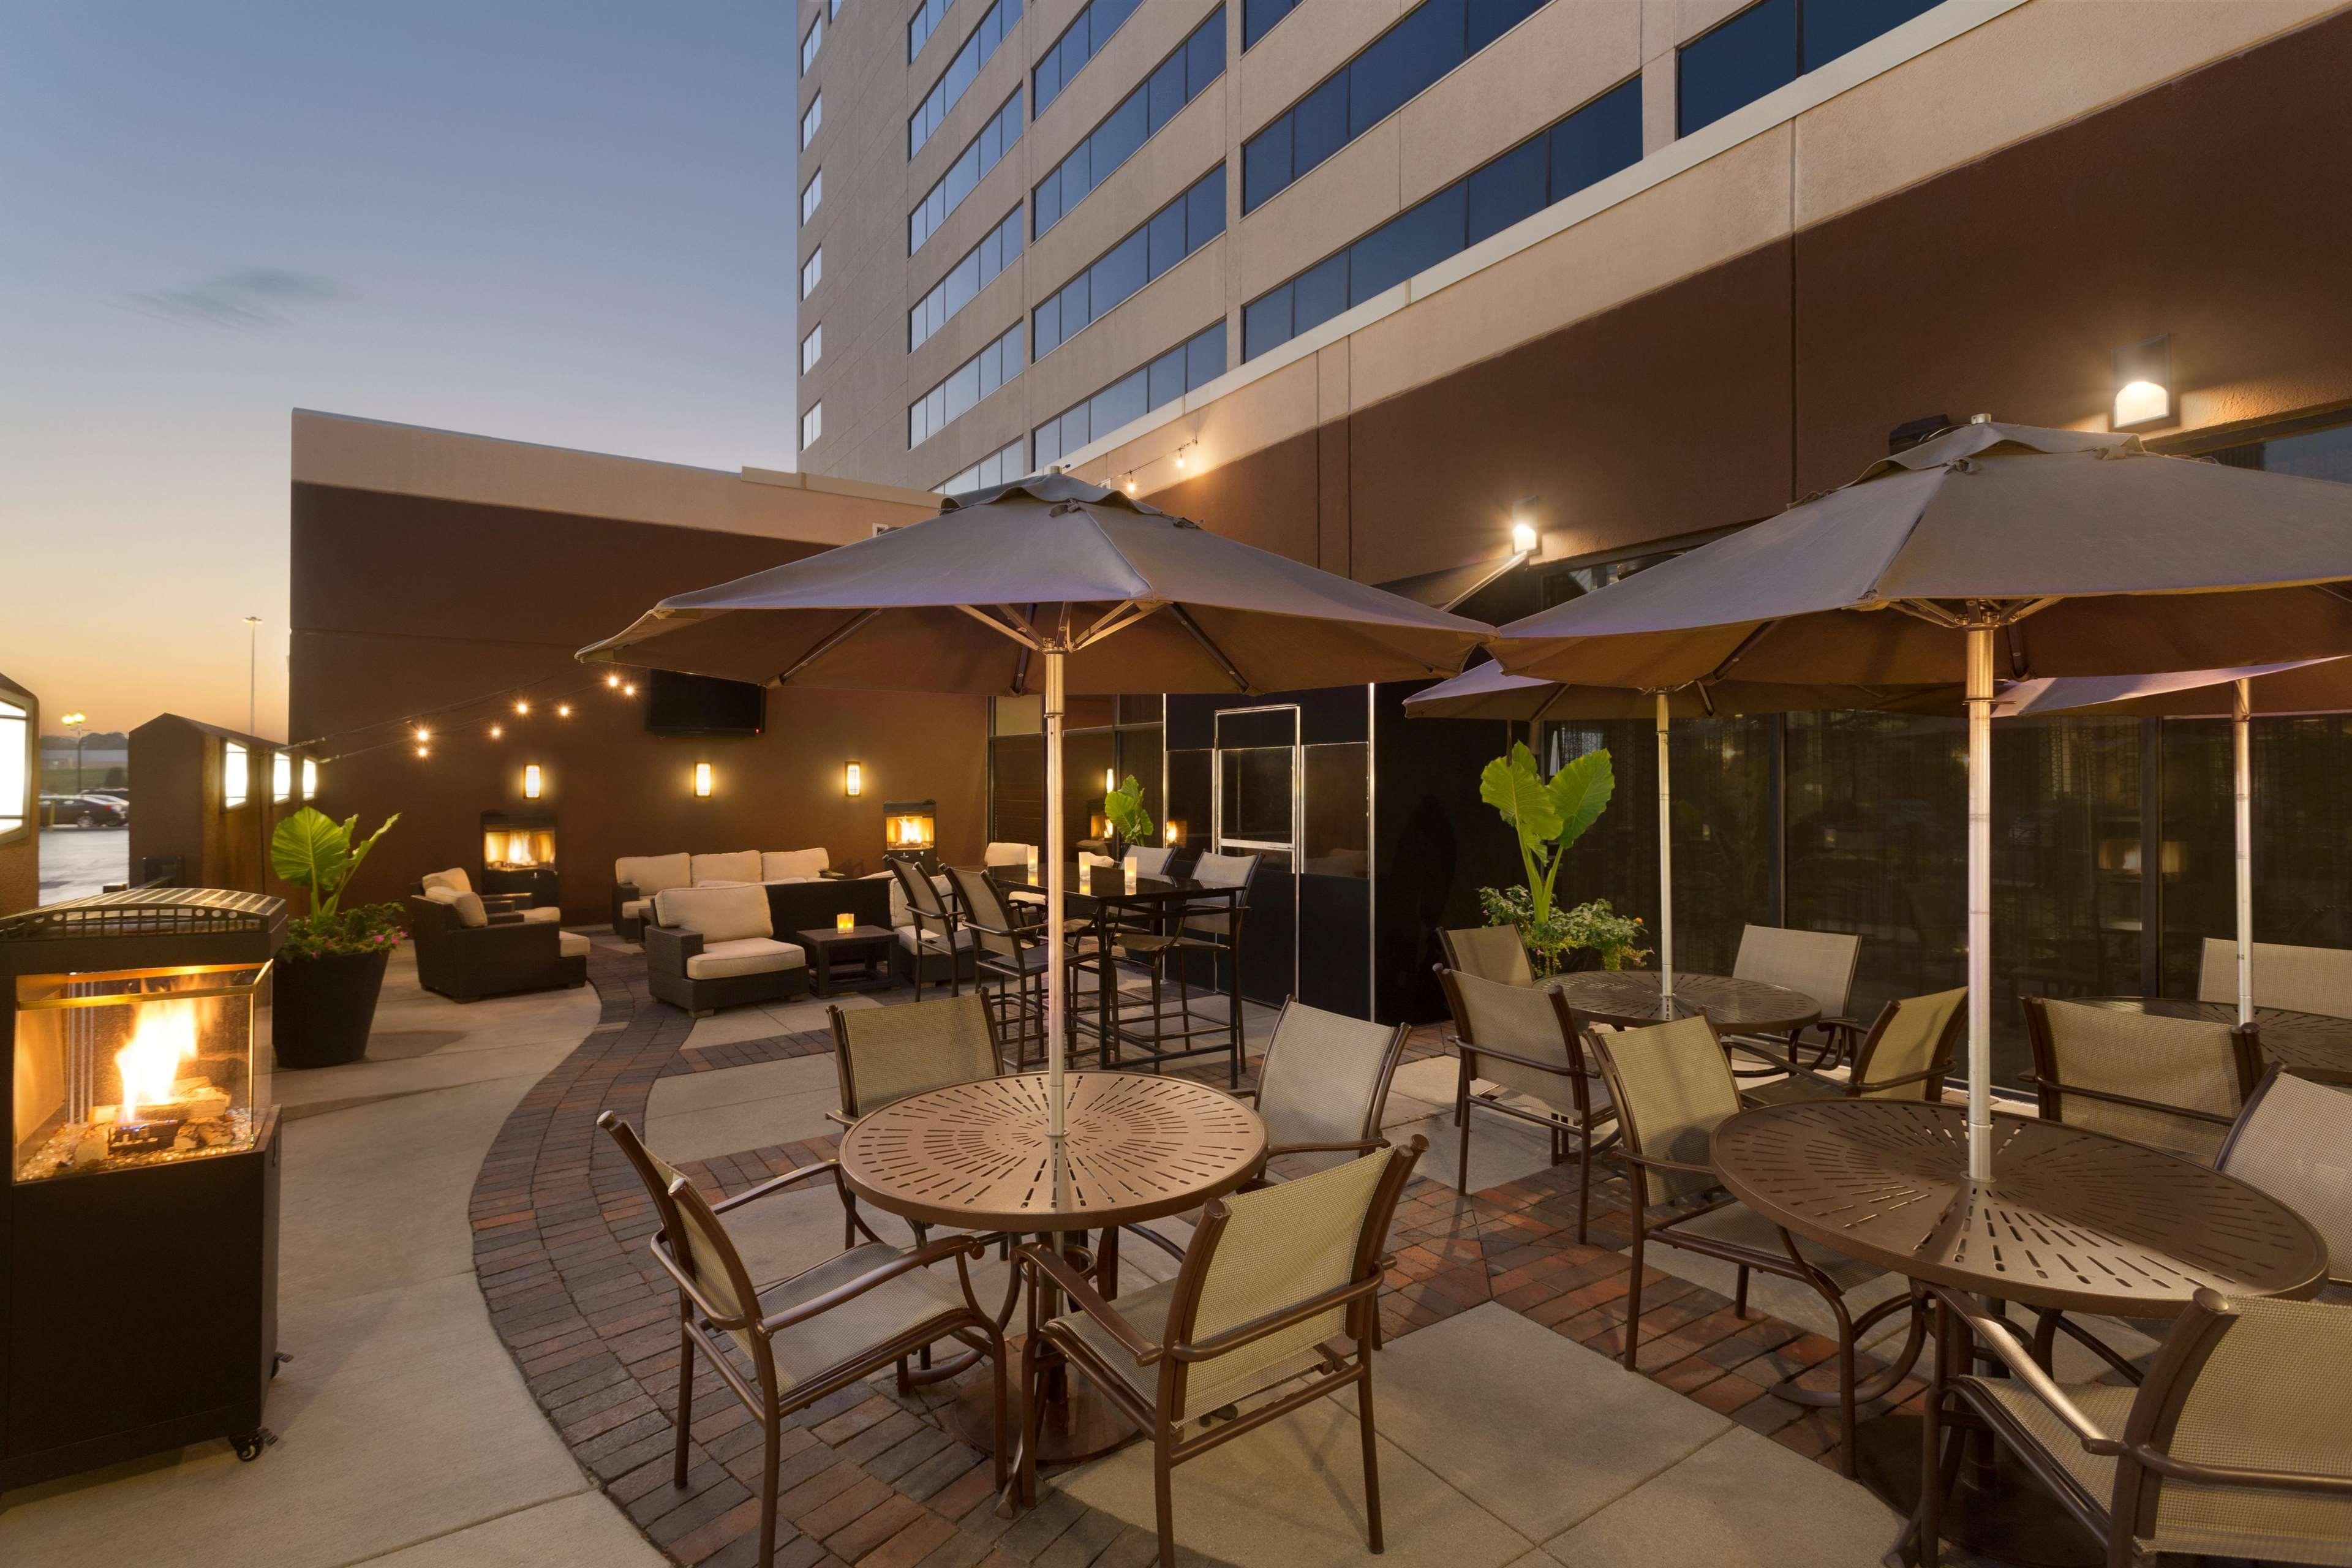 Hilton Chicago Oak Brook Suites Oakbrook Terrace Illinois Il